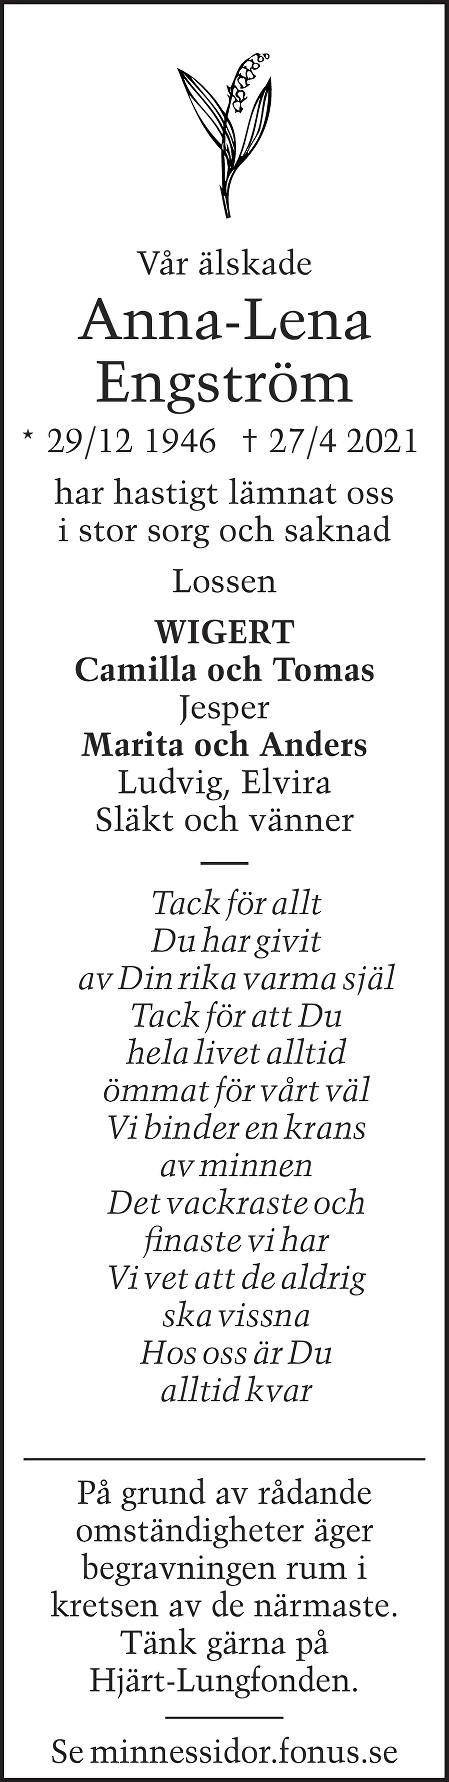 Anna-Lena Engström Death notice